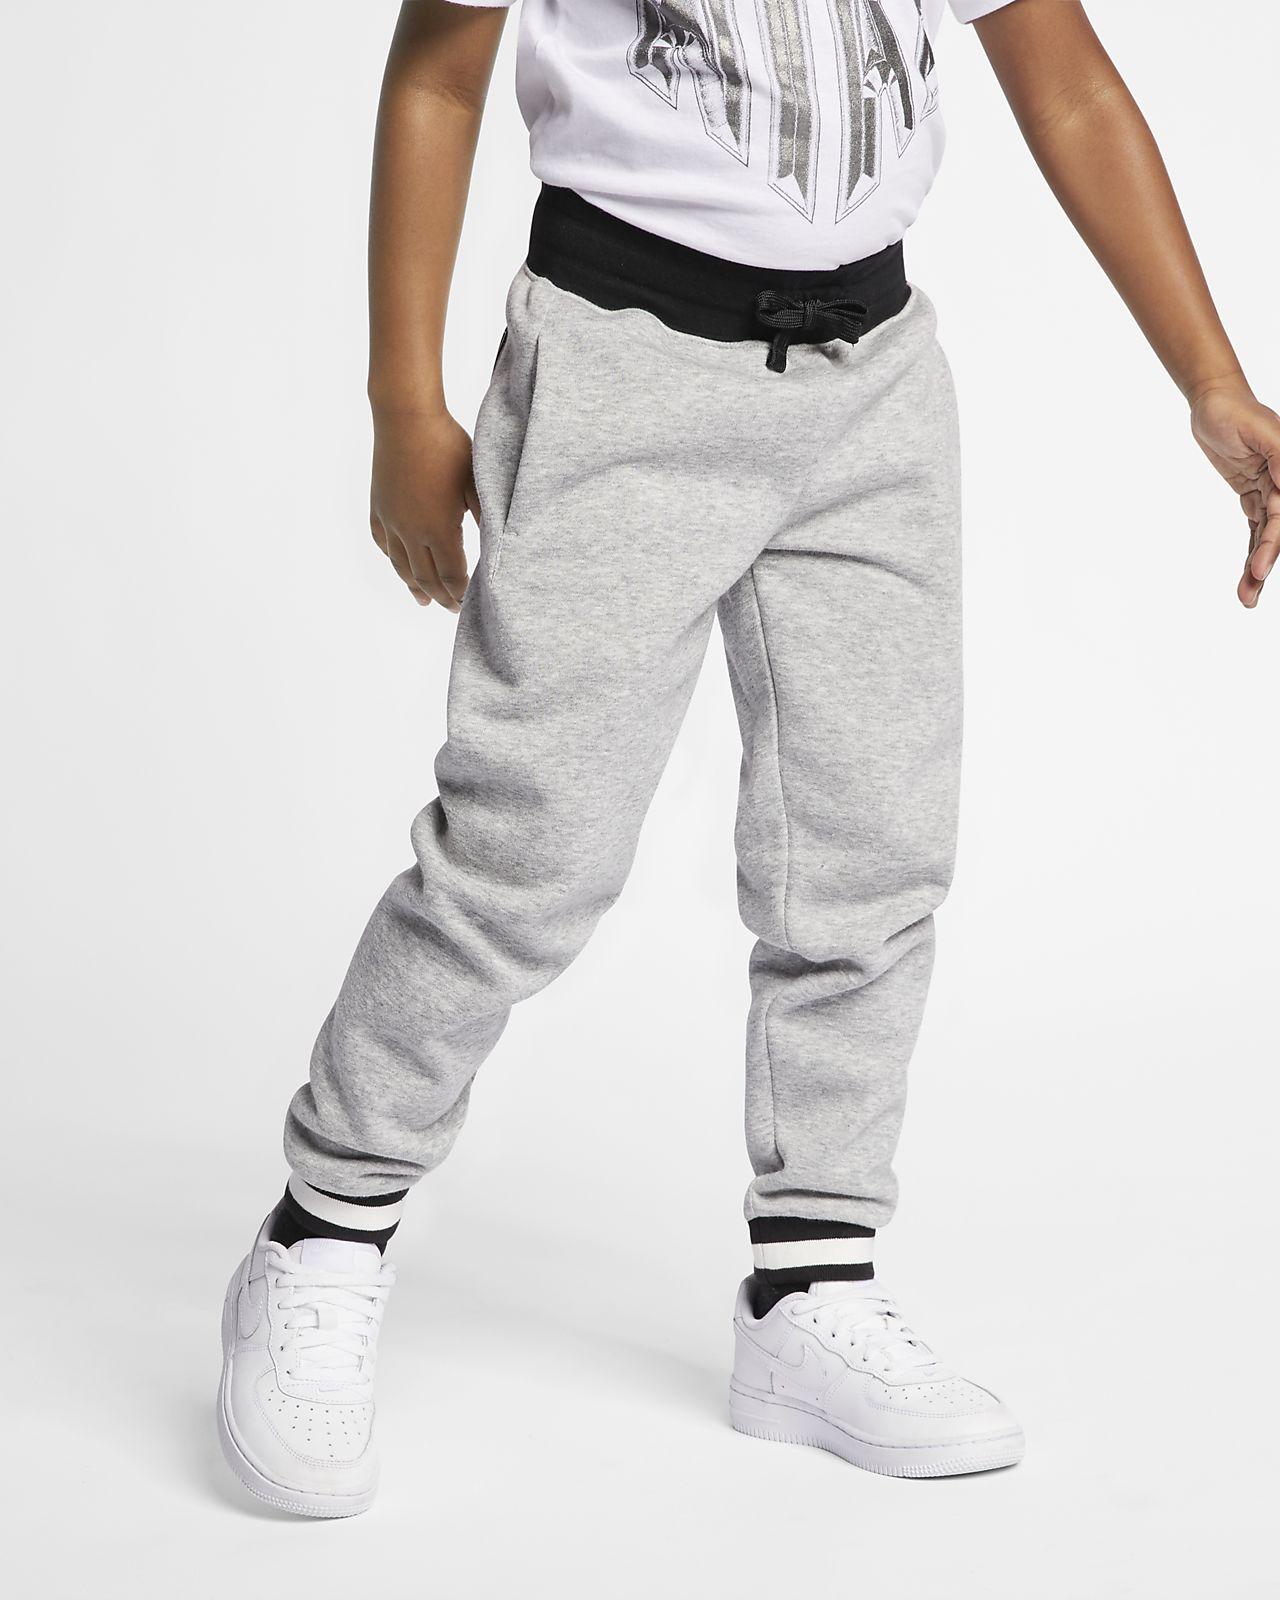 Nike Air-fleecebukser til små børn